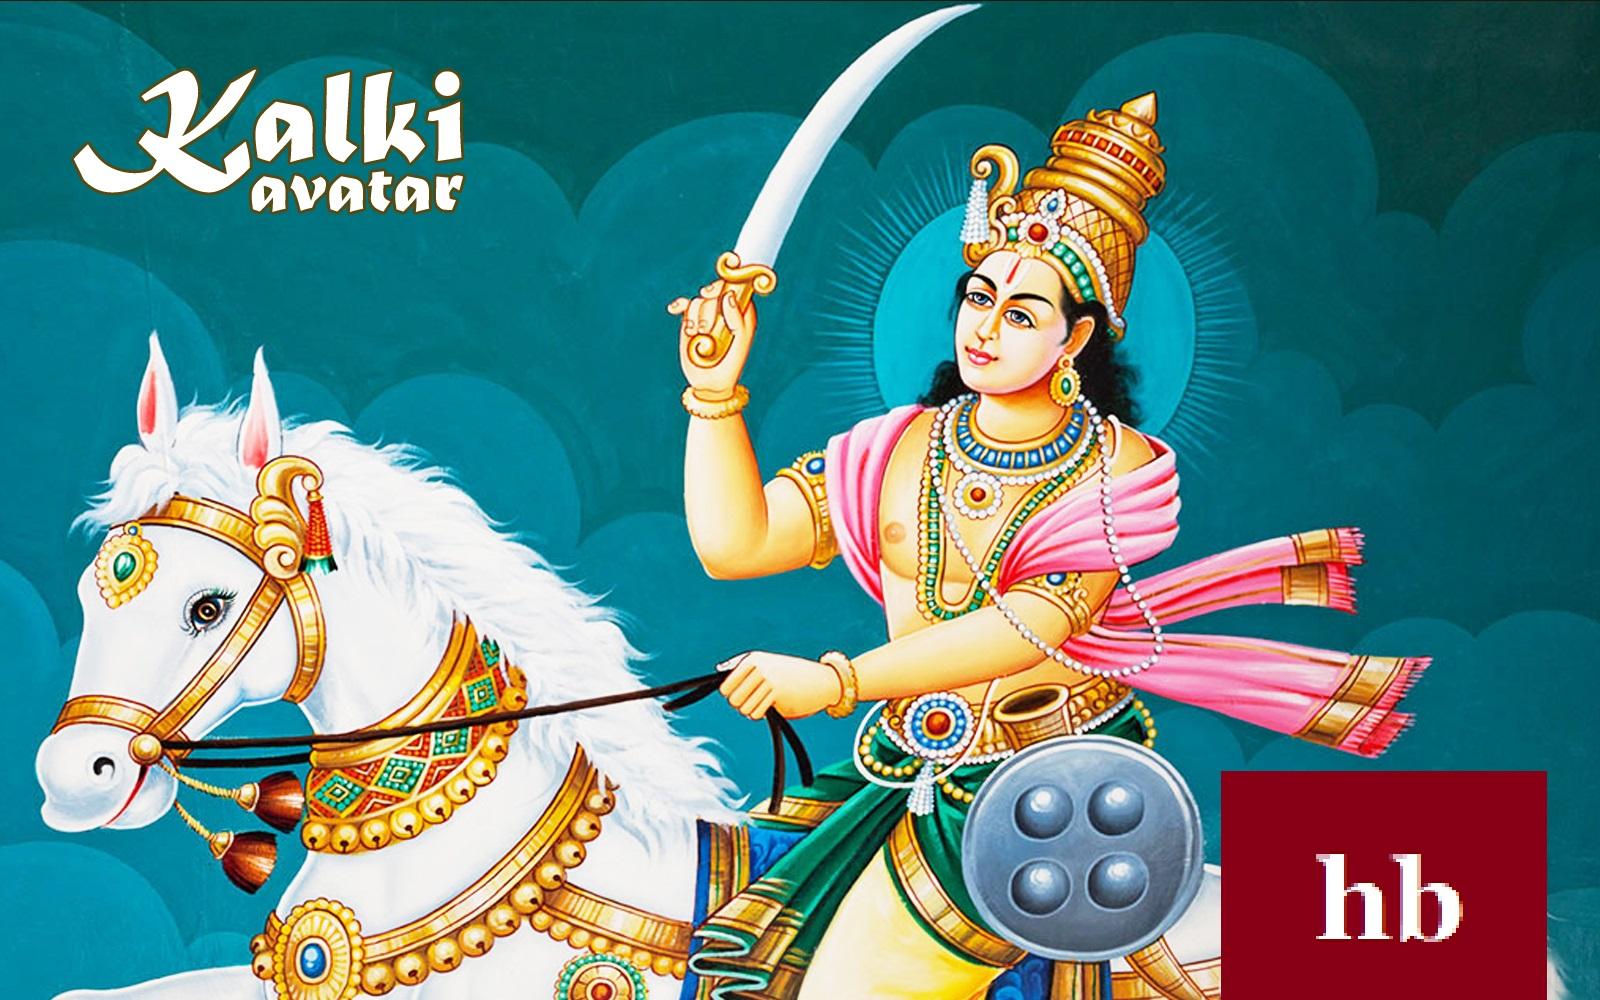 Lord Vishnu images, wallpapers, photos & pics, download Lord Vishnu